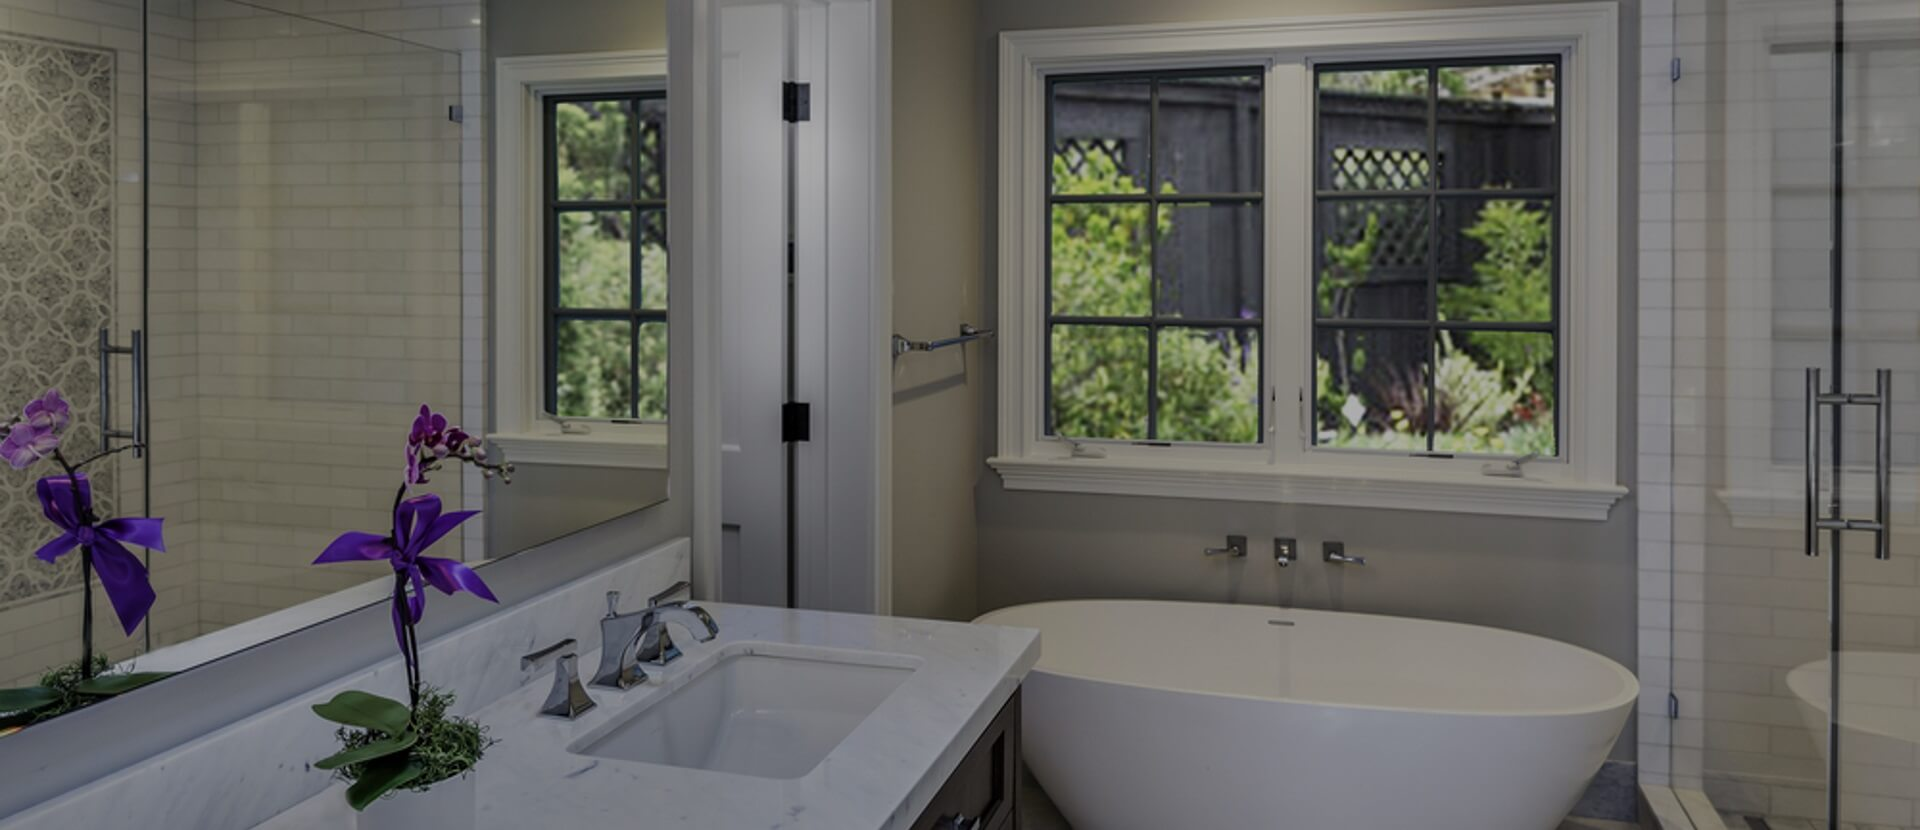 High Quality Bathroom Renovations